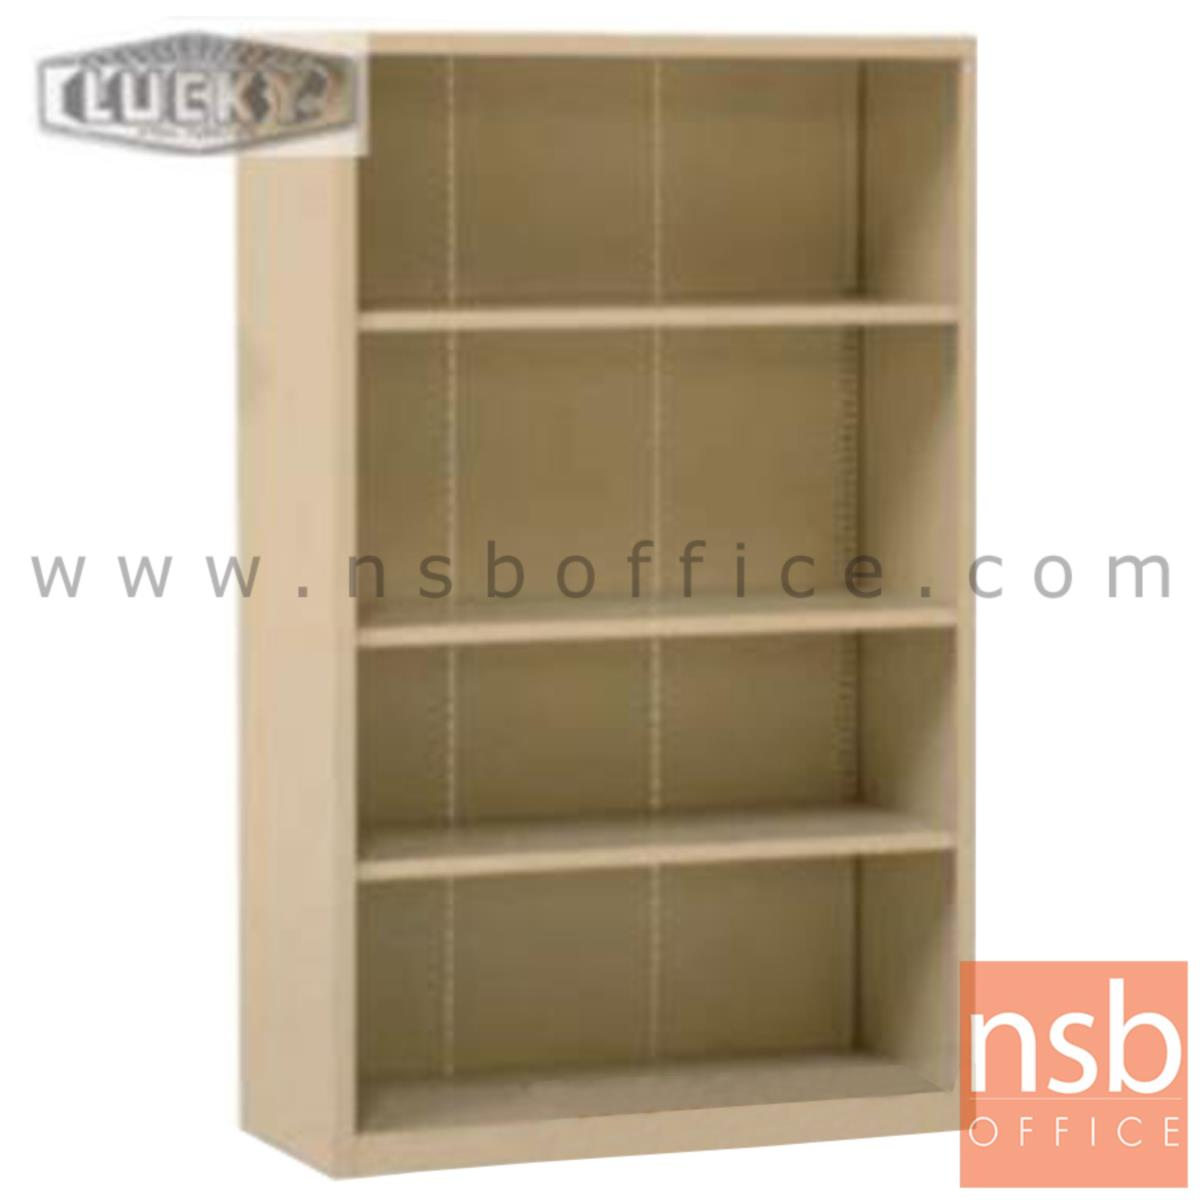 E28A032:ตู้วางหนังสือ 4 ช่องโล่ง 76.2W*32D*121.9H cm. รุ่น LUCKY-SB-3048